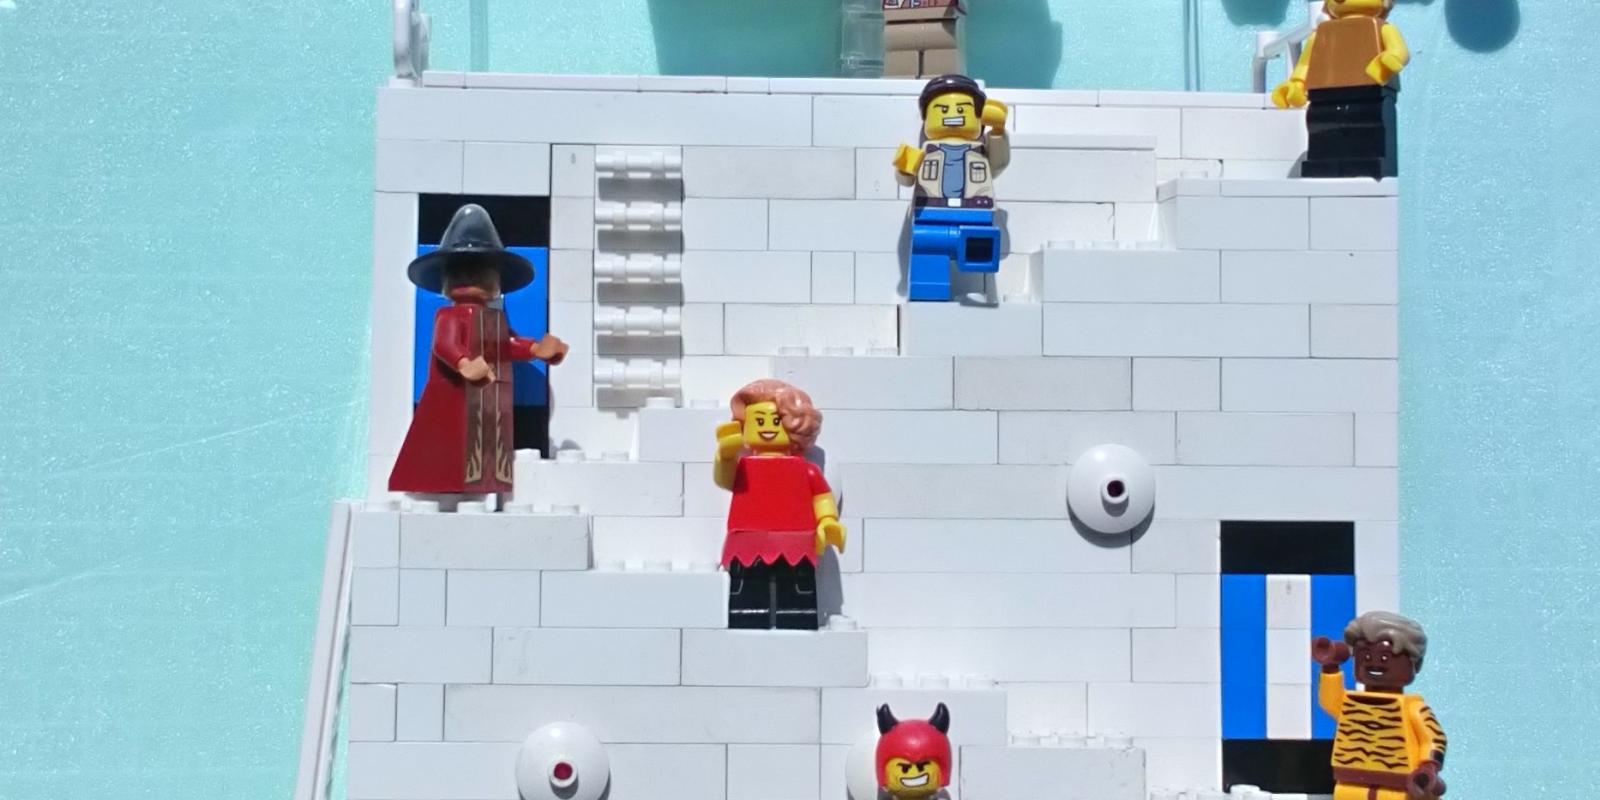 Orpheus in the Underworld Lego Challenge